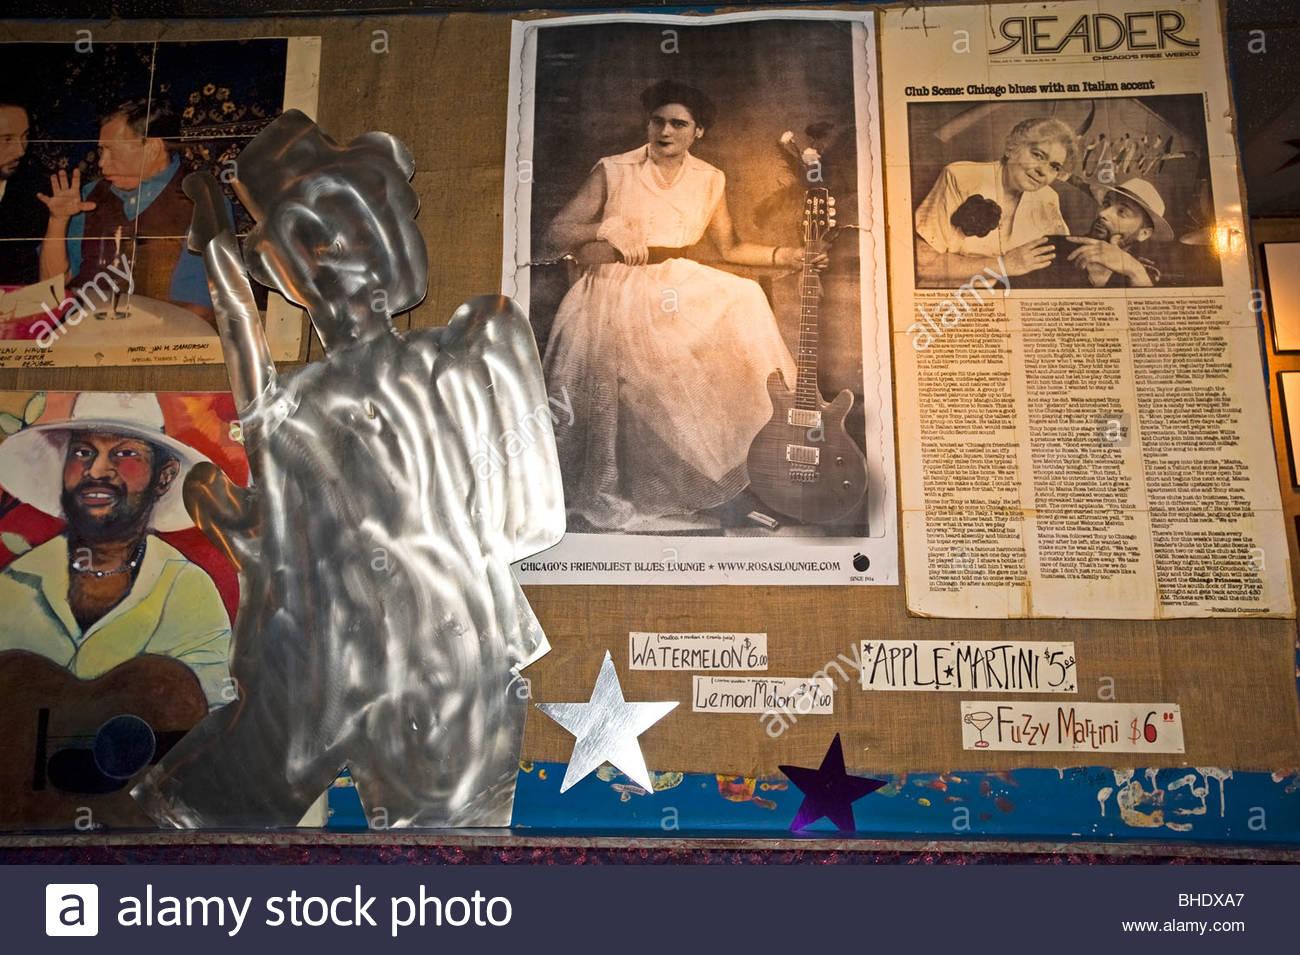 Rosas Lounge Blues club, Chicago, Illinois, Usa - Stock Image